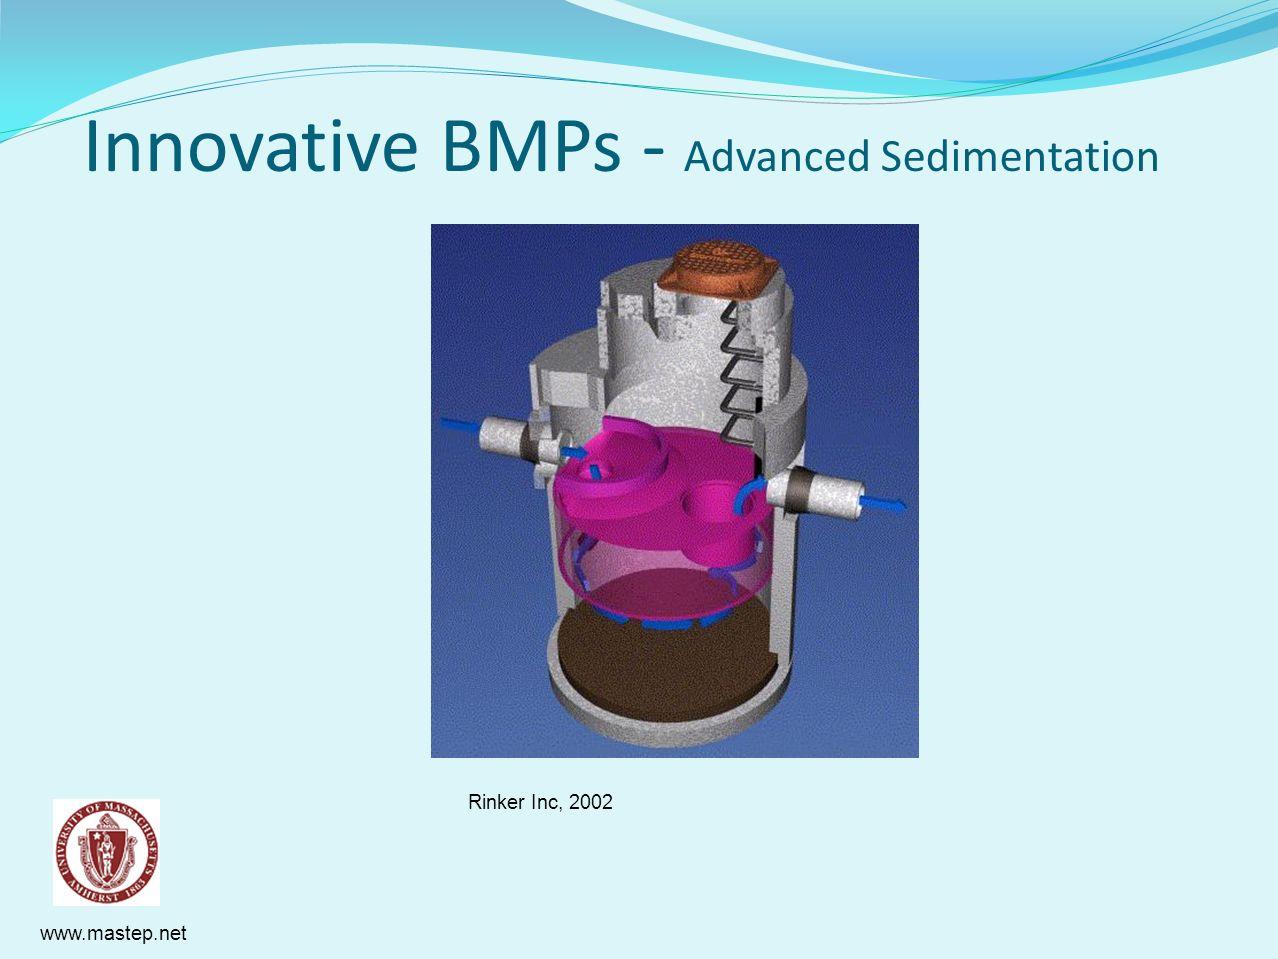 www.mastep.net Innovative BMPs - Advanced Sedimentation Rinker Inc, 2002